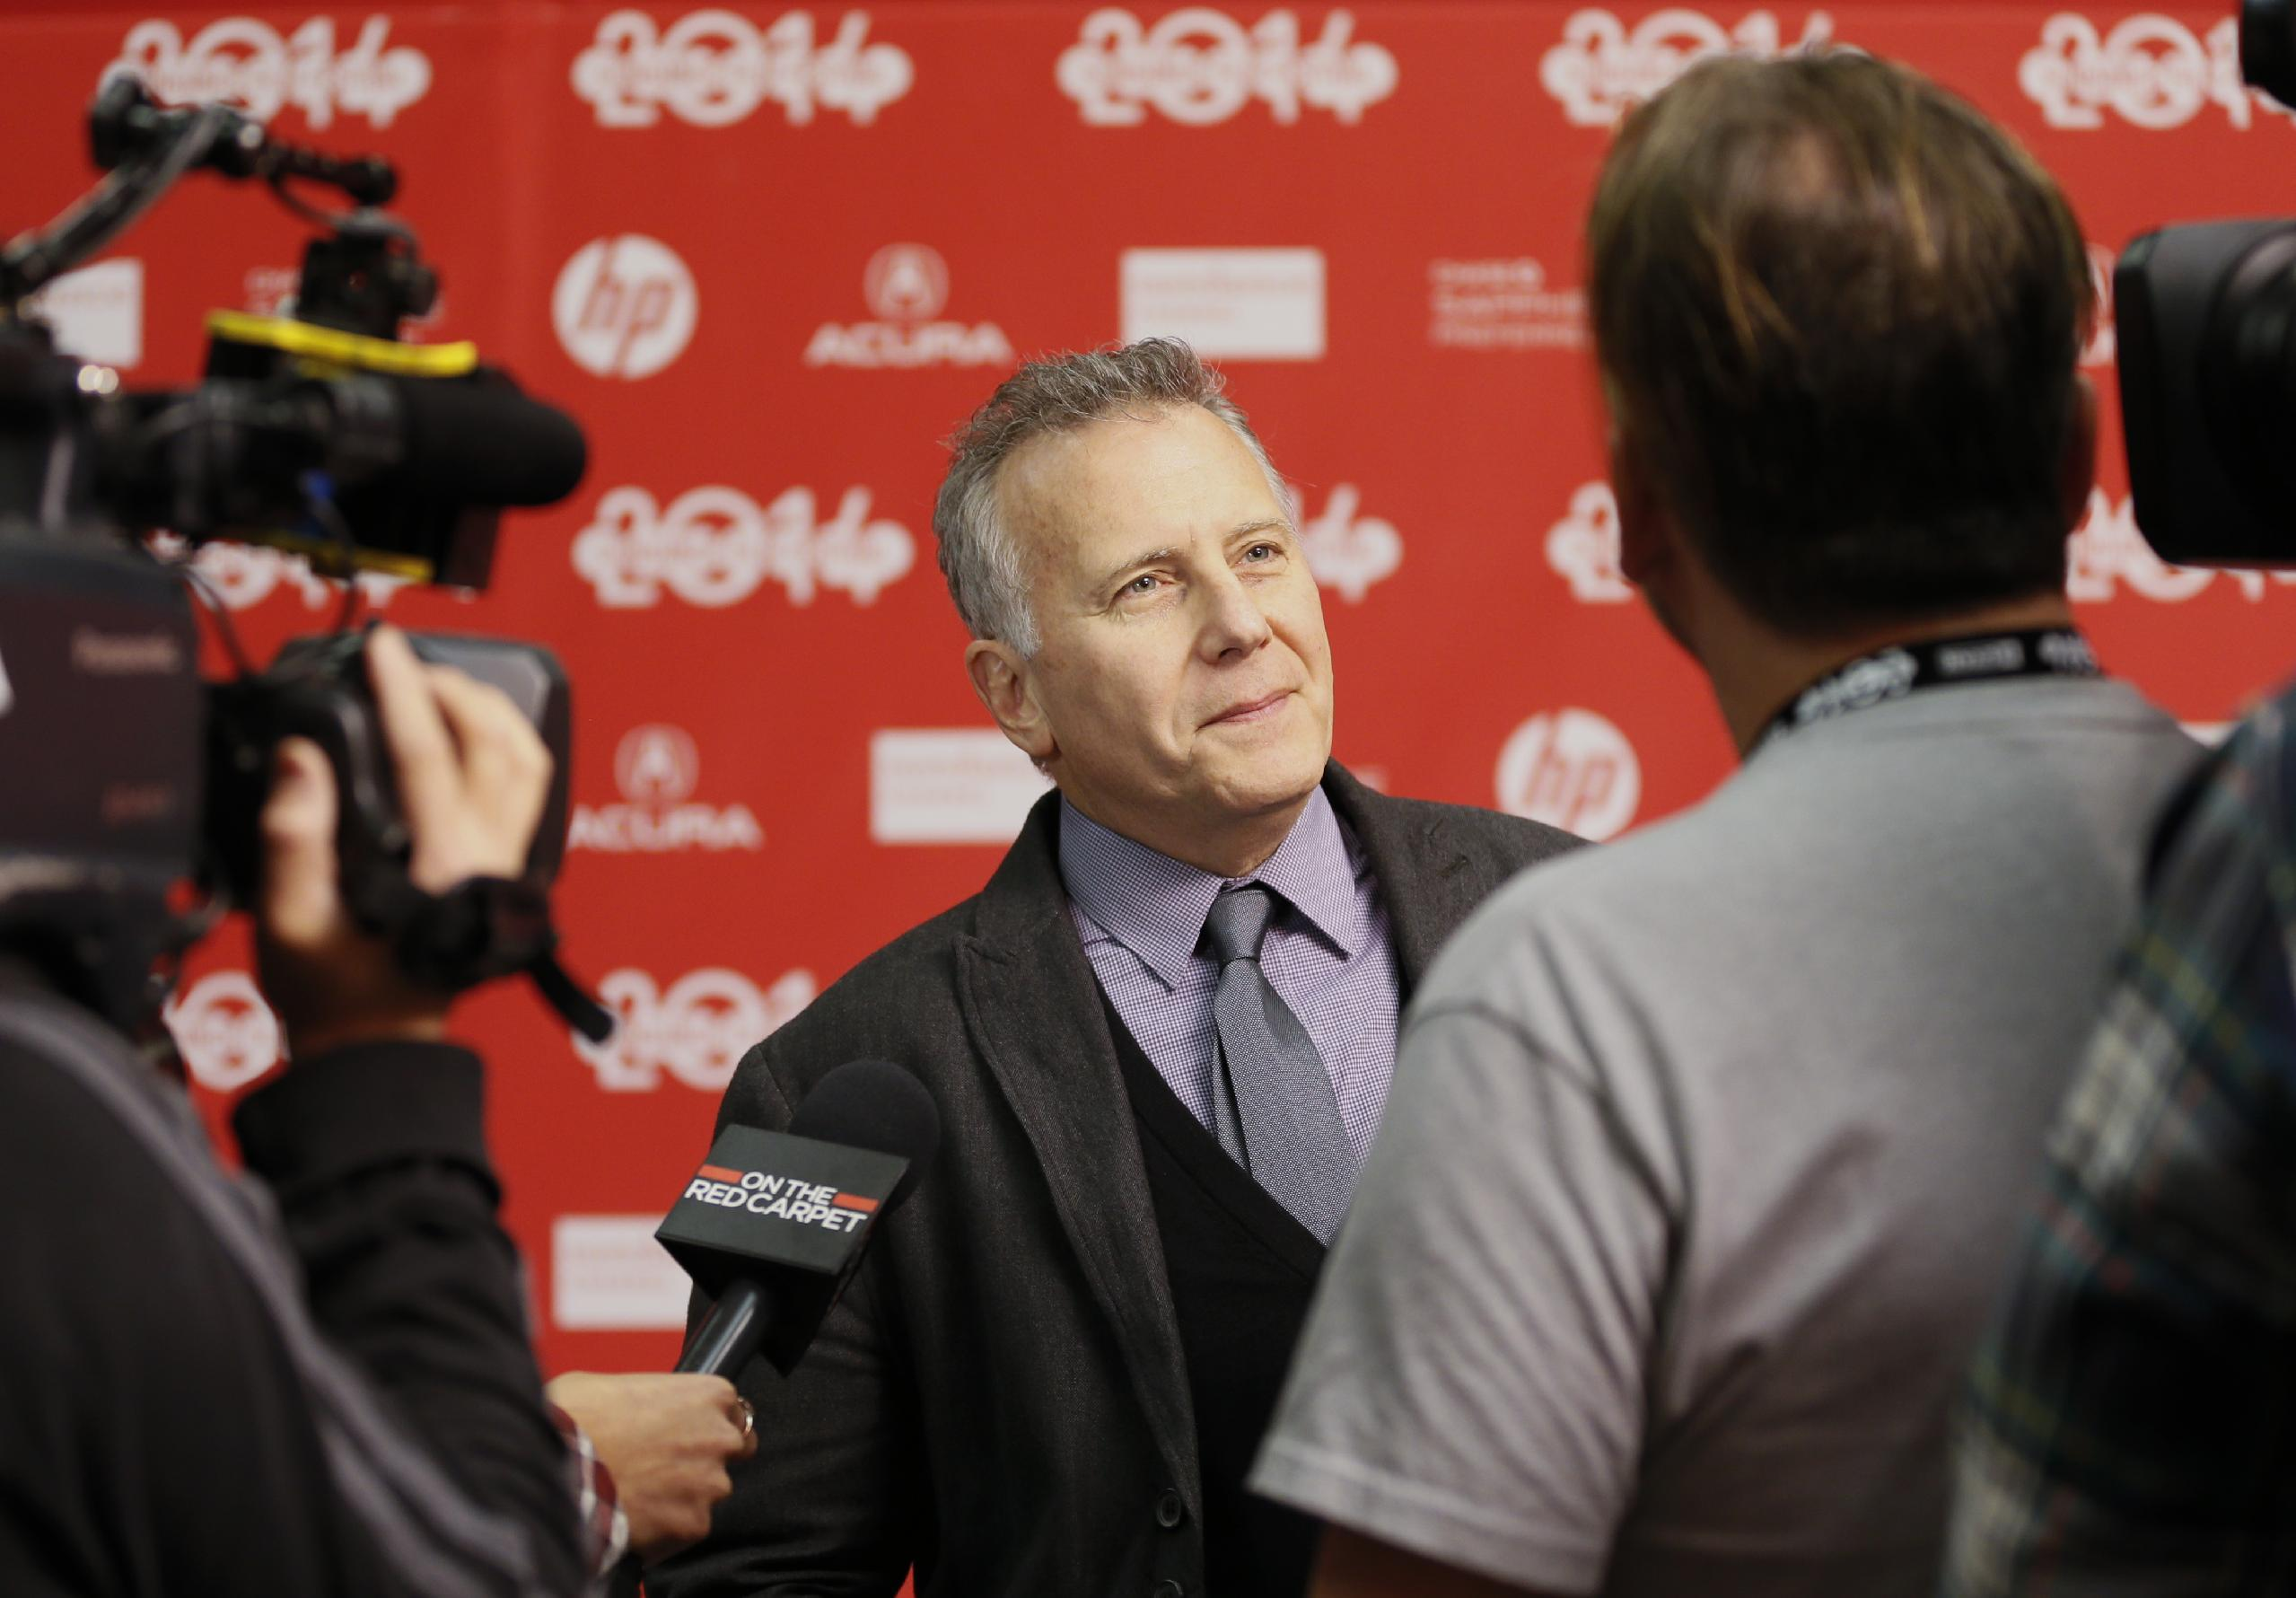 "Cast member Paul Reiser is interviewed at the opening night premiere of the film ""Whiplash"" during the 2014 Sundance Film Festival, on Thursday, Jan. 16, 2014, in Park City, Utah. (Photo by Danny Moloshok/Invision/AP)"